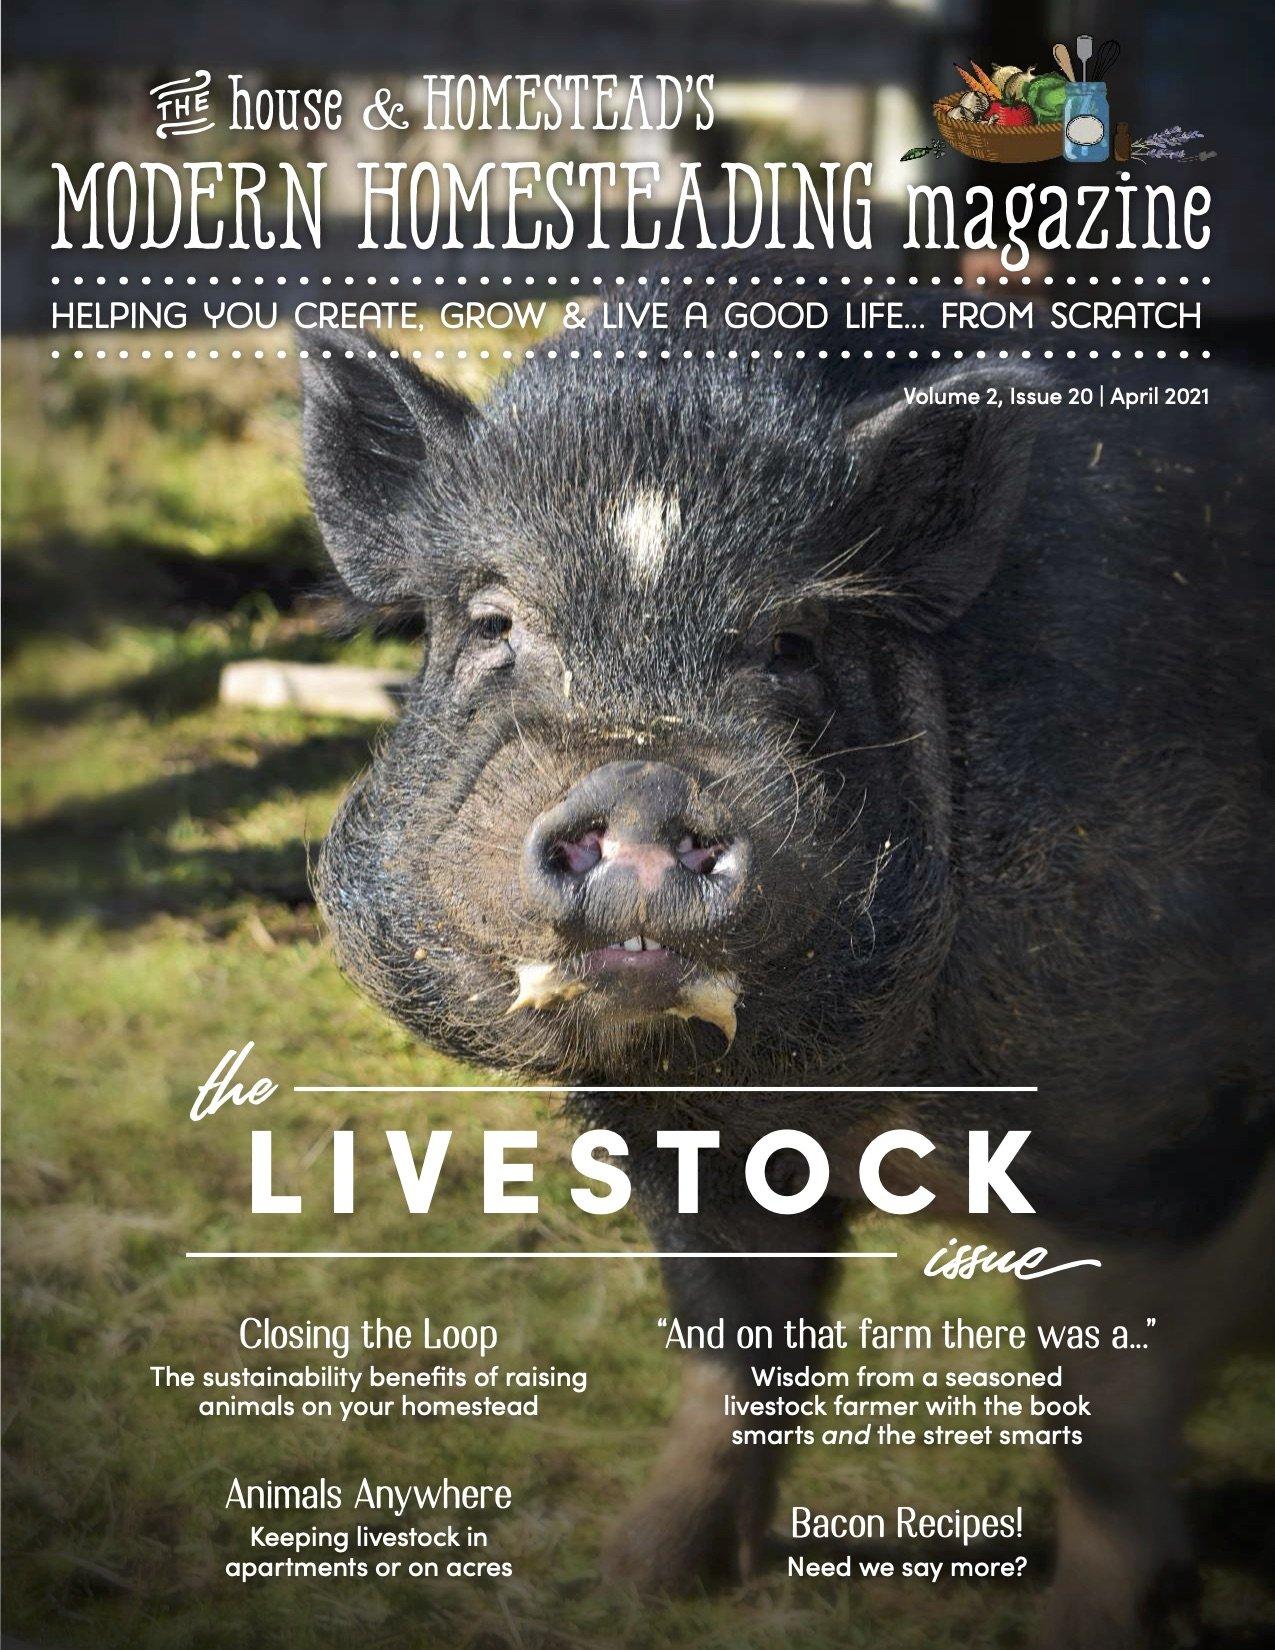 Modern Homesteading Magazine | The Livestock Issue | April 2021